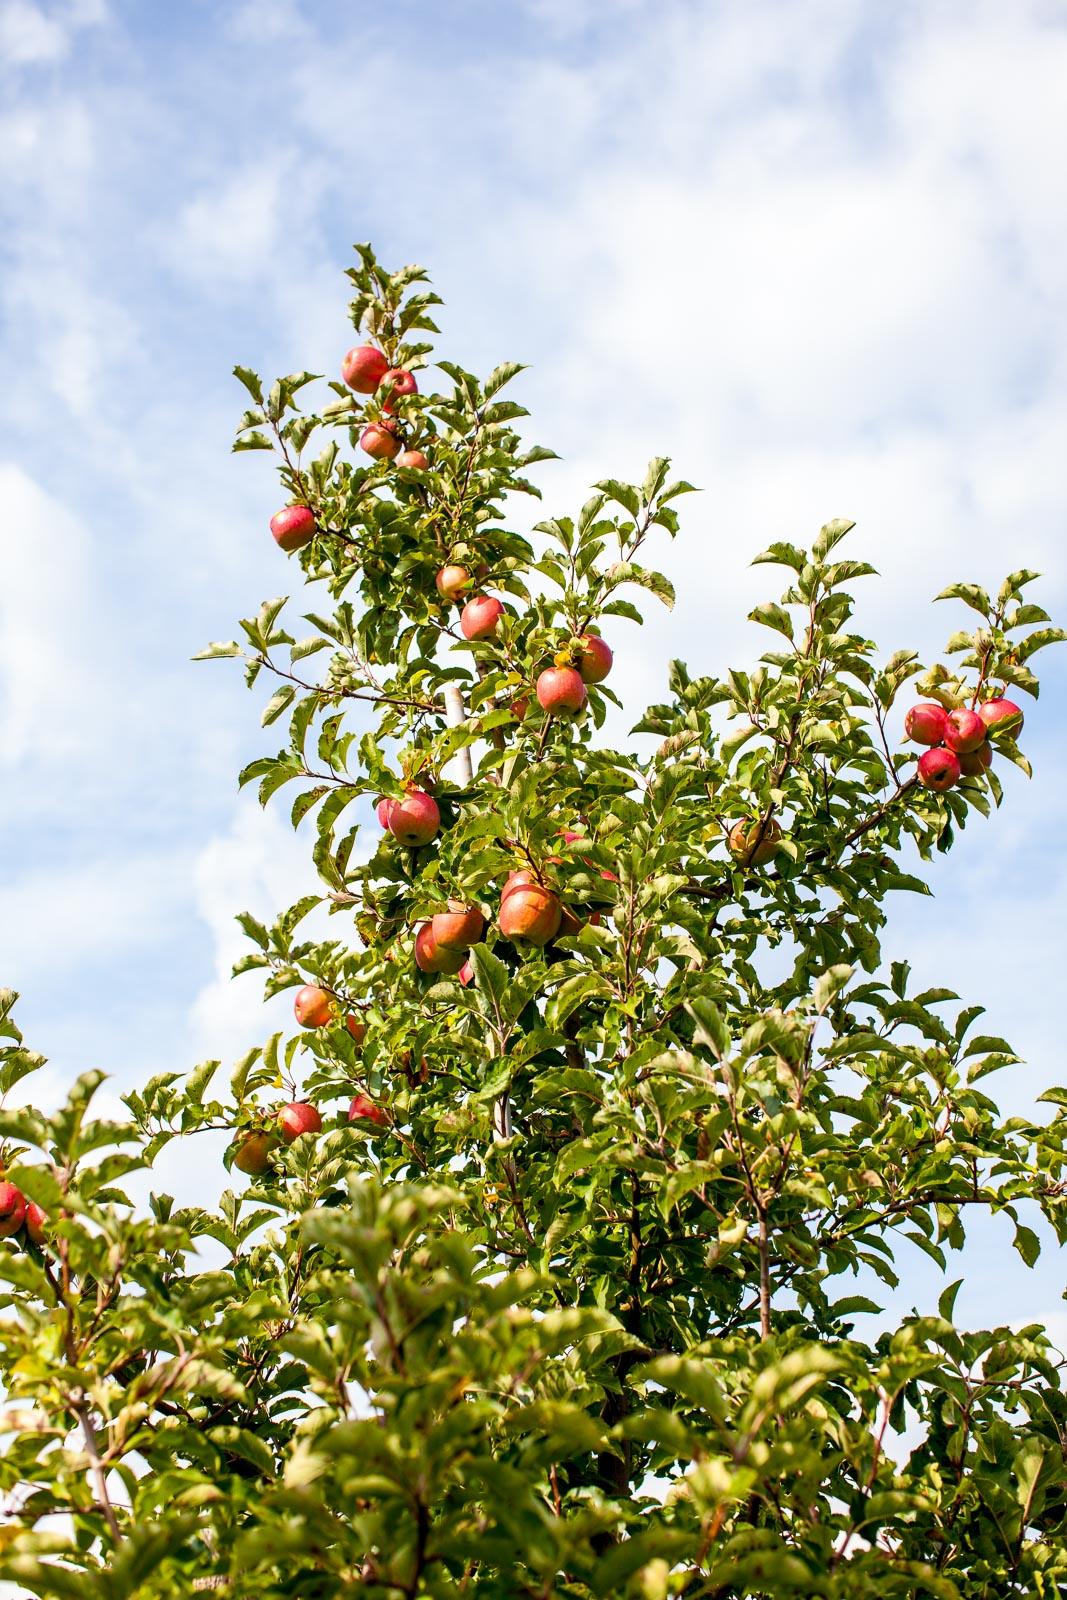 fishkill-farm-applepiking-2016-robertiaga-4